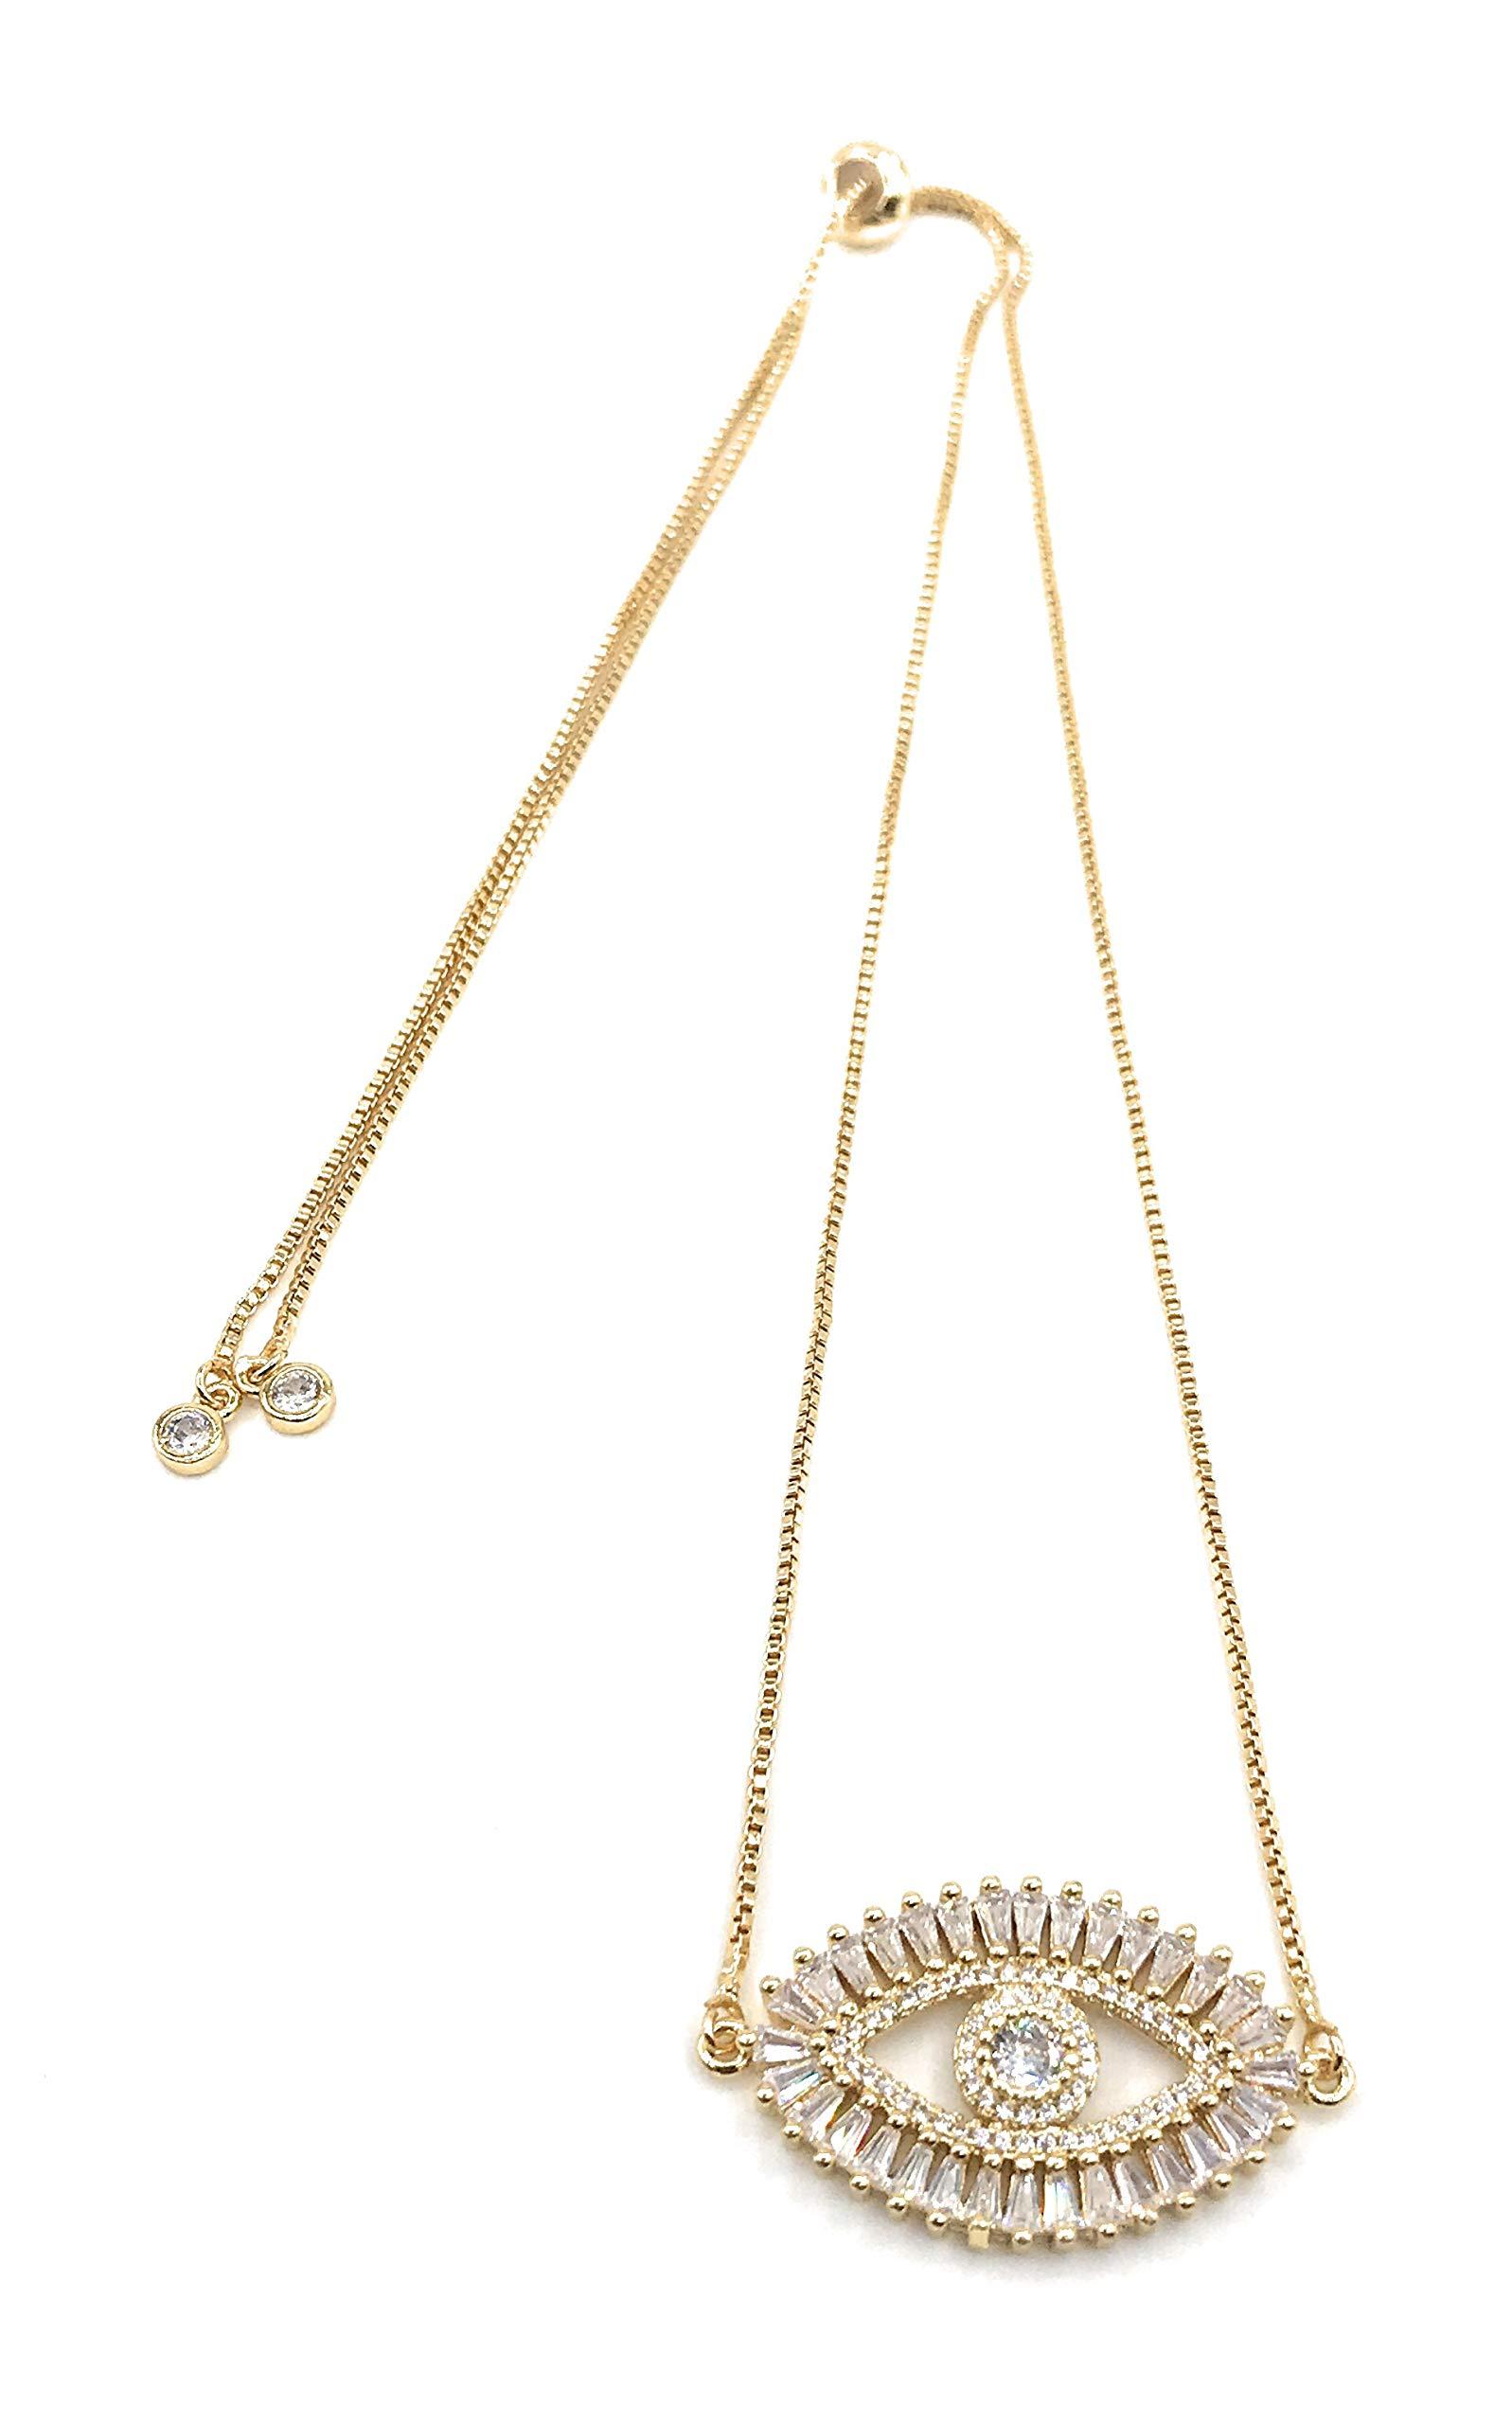 LESLIE BOULES Gold Evil Eye Necklace 18K Gold Plated Sliding Adjustable Chain Choker Jewelry